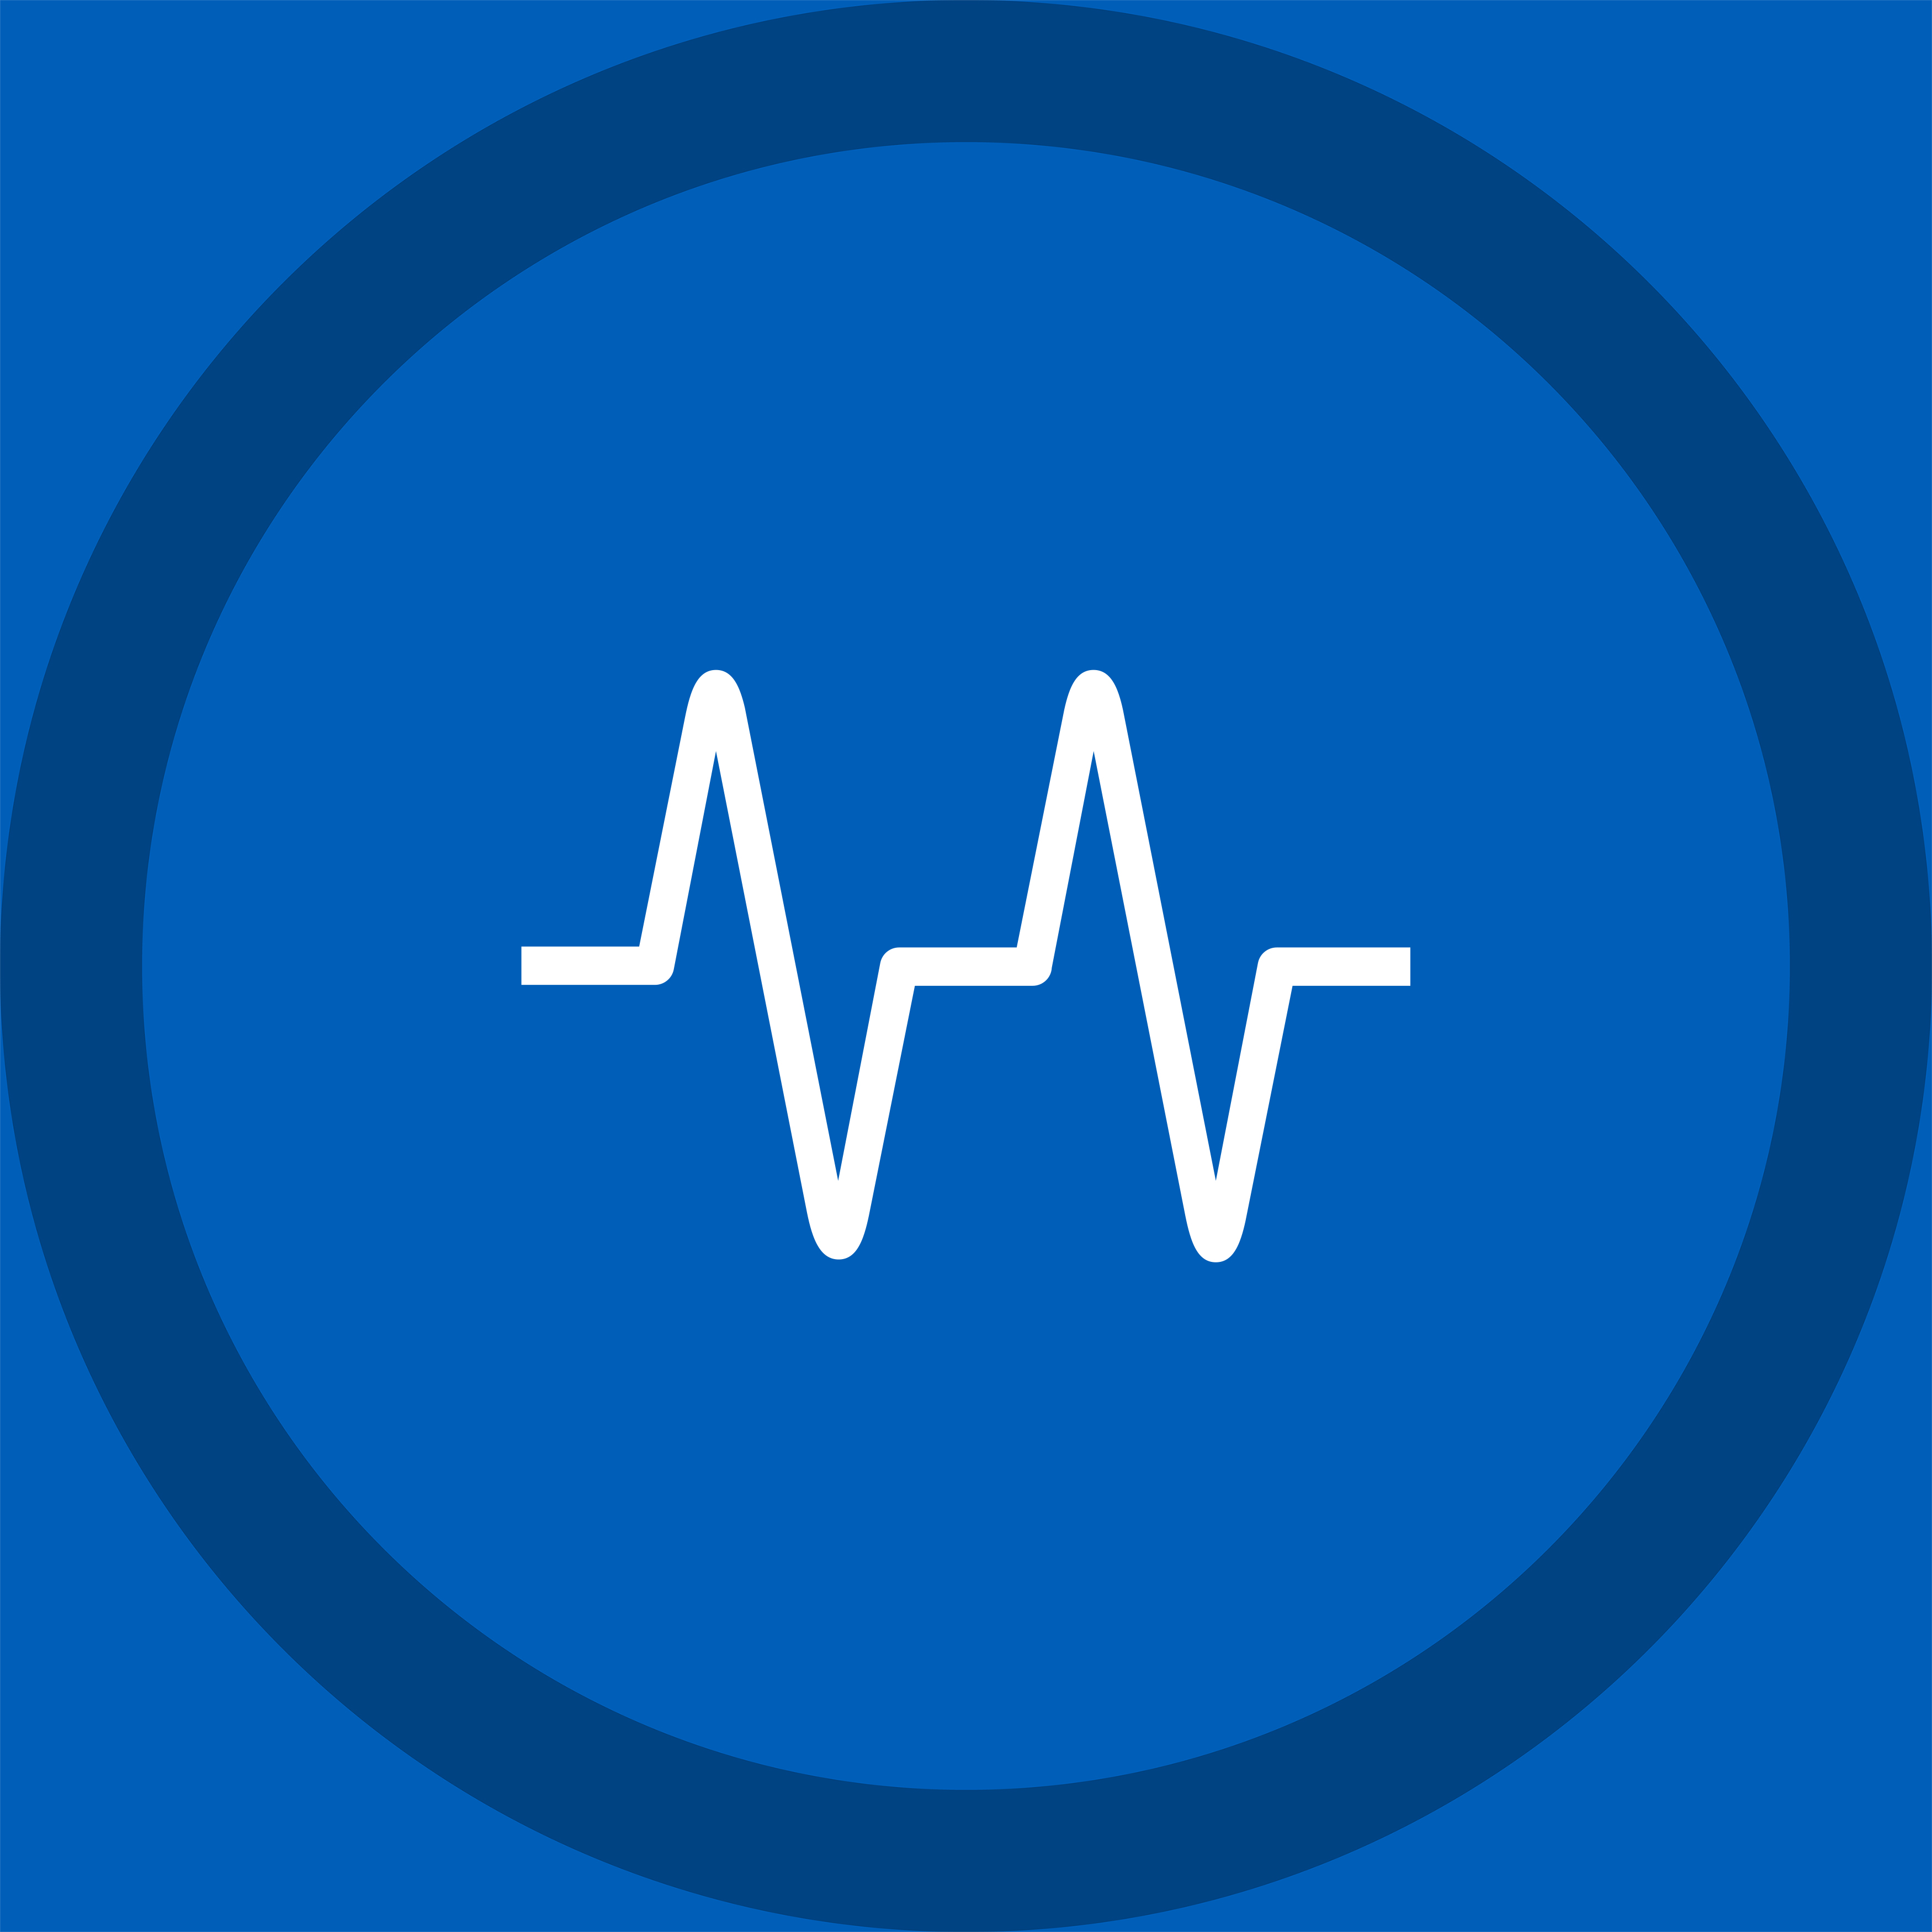 Elektrocardiogrammen